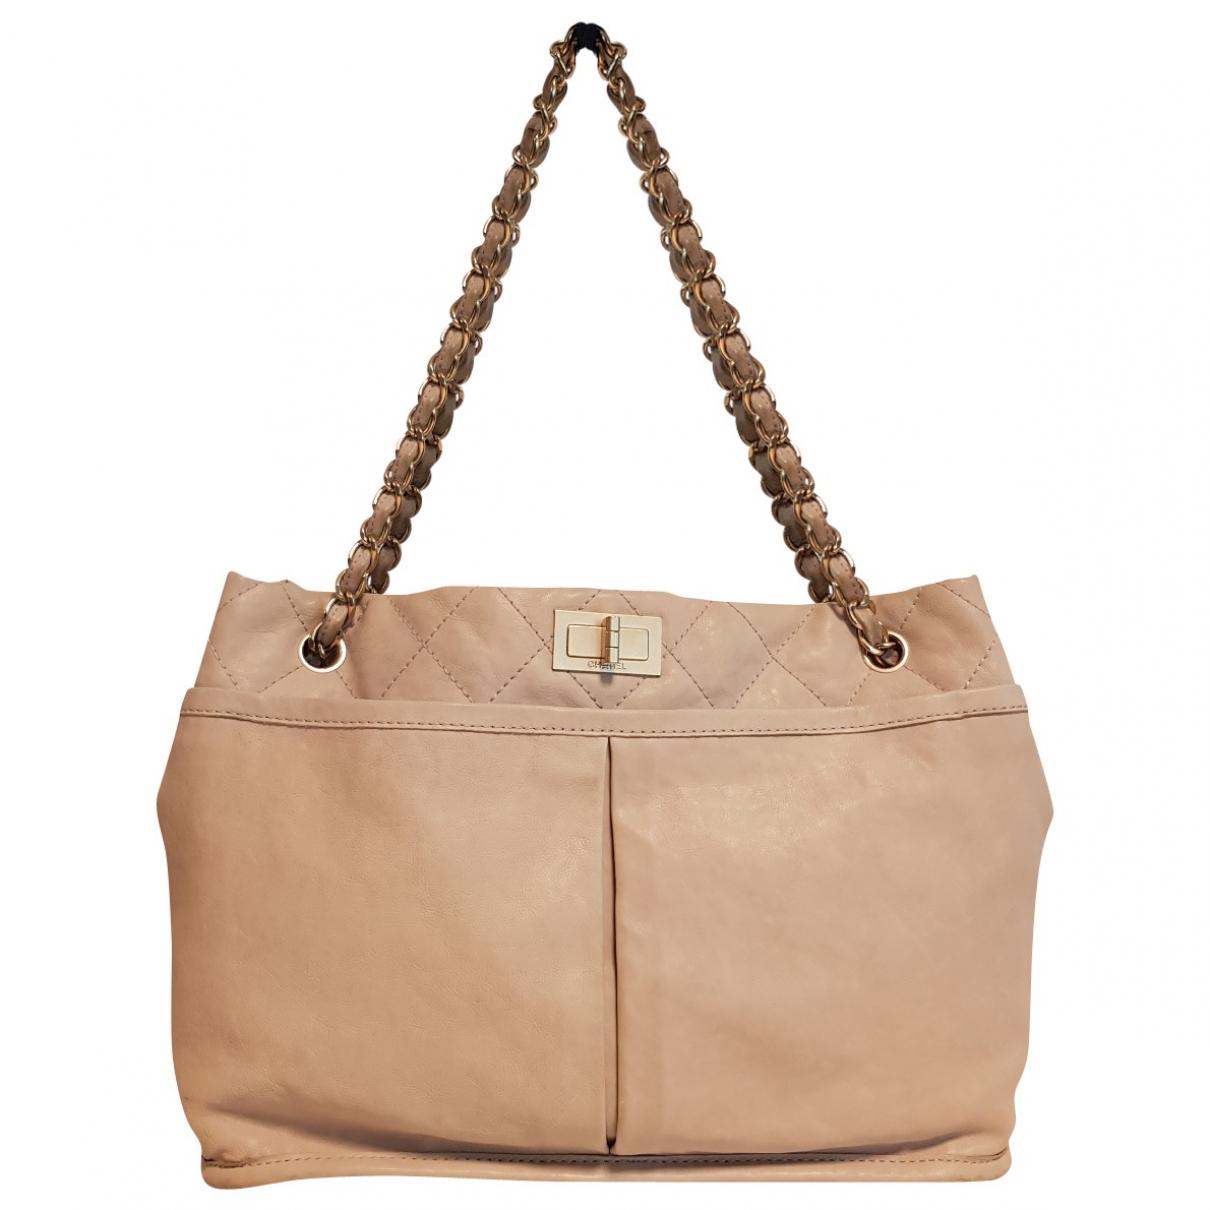 Chanel 2.55 Beige Leather handbag for Women \N